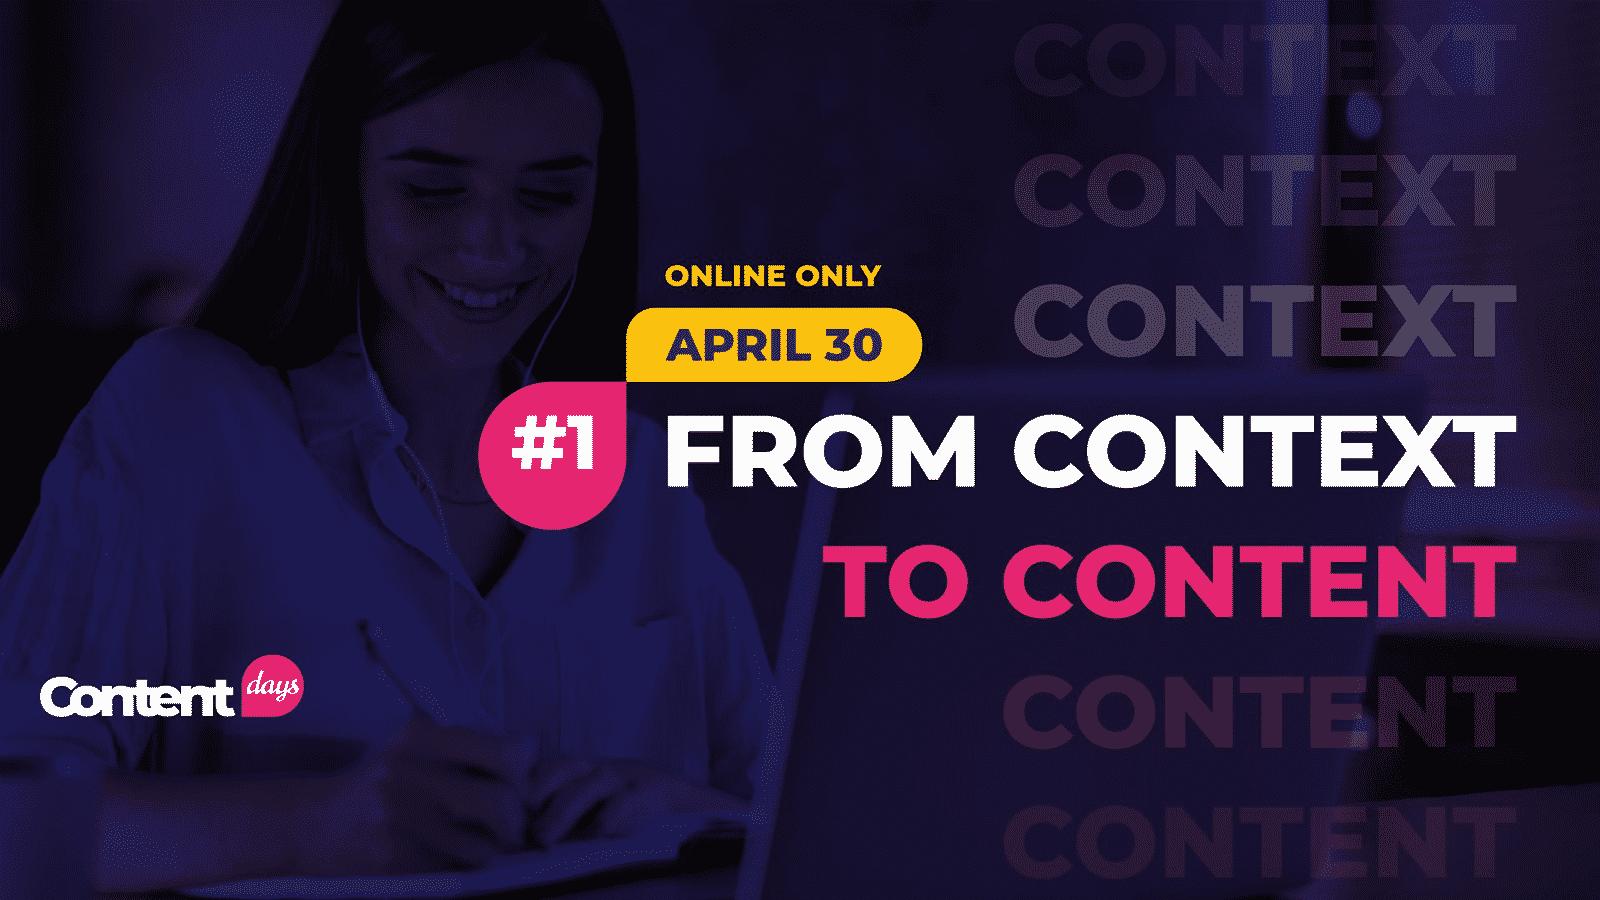 ContentDays